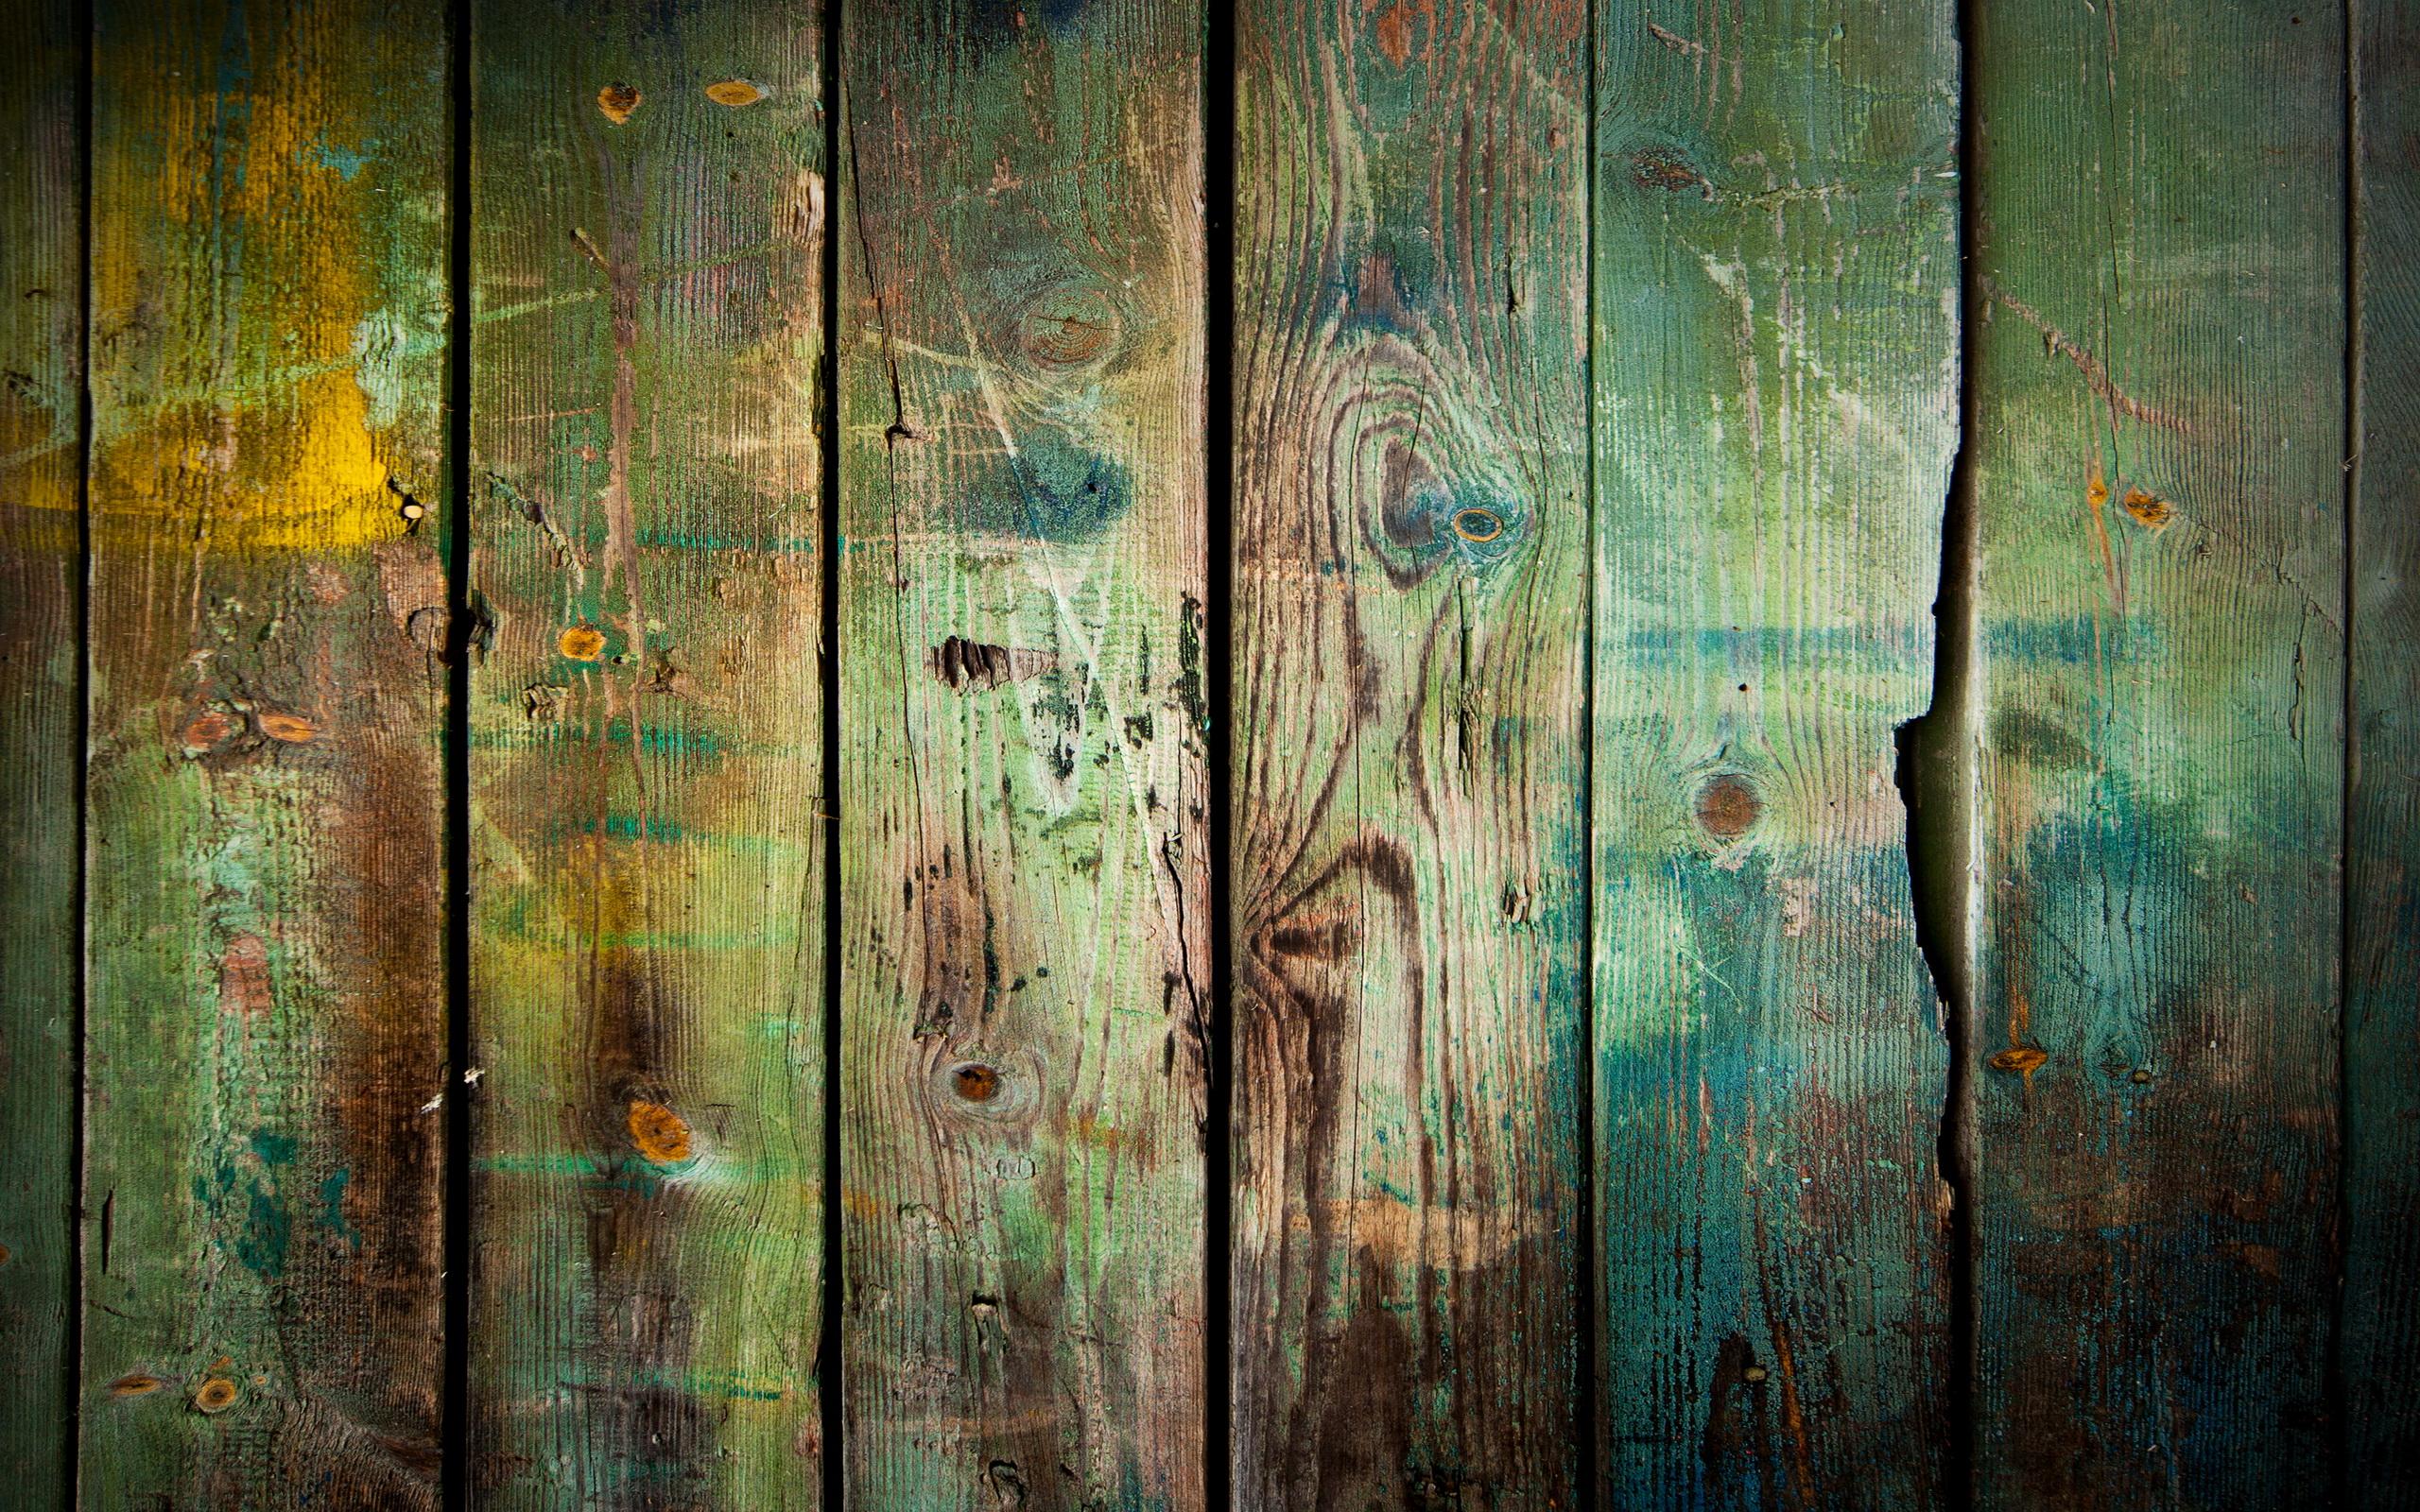 Fondos De Pantalla Madera Hd Vintage Para Fondo Celular En: Wood Full HD Wallpaper And Background Image